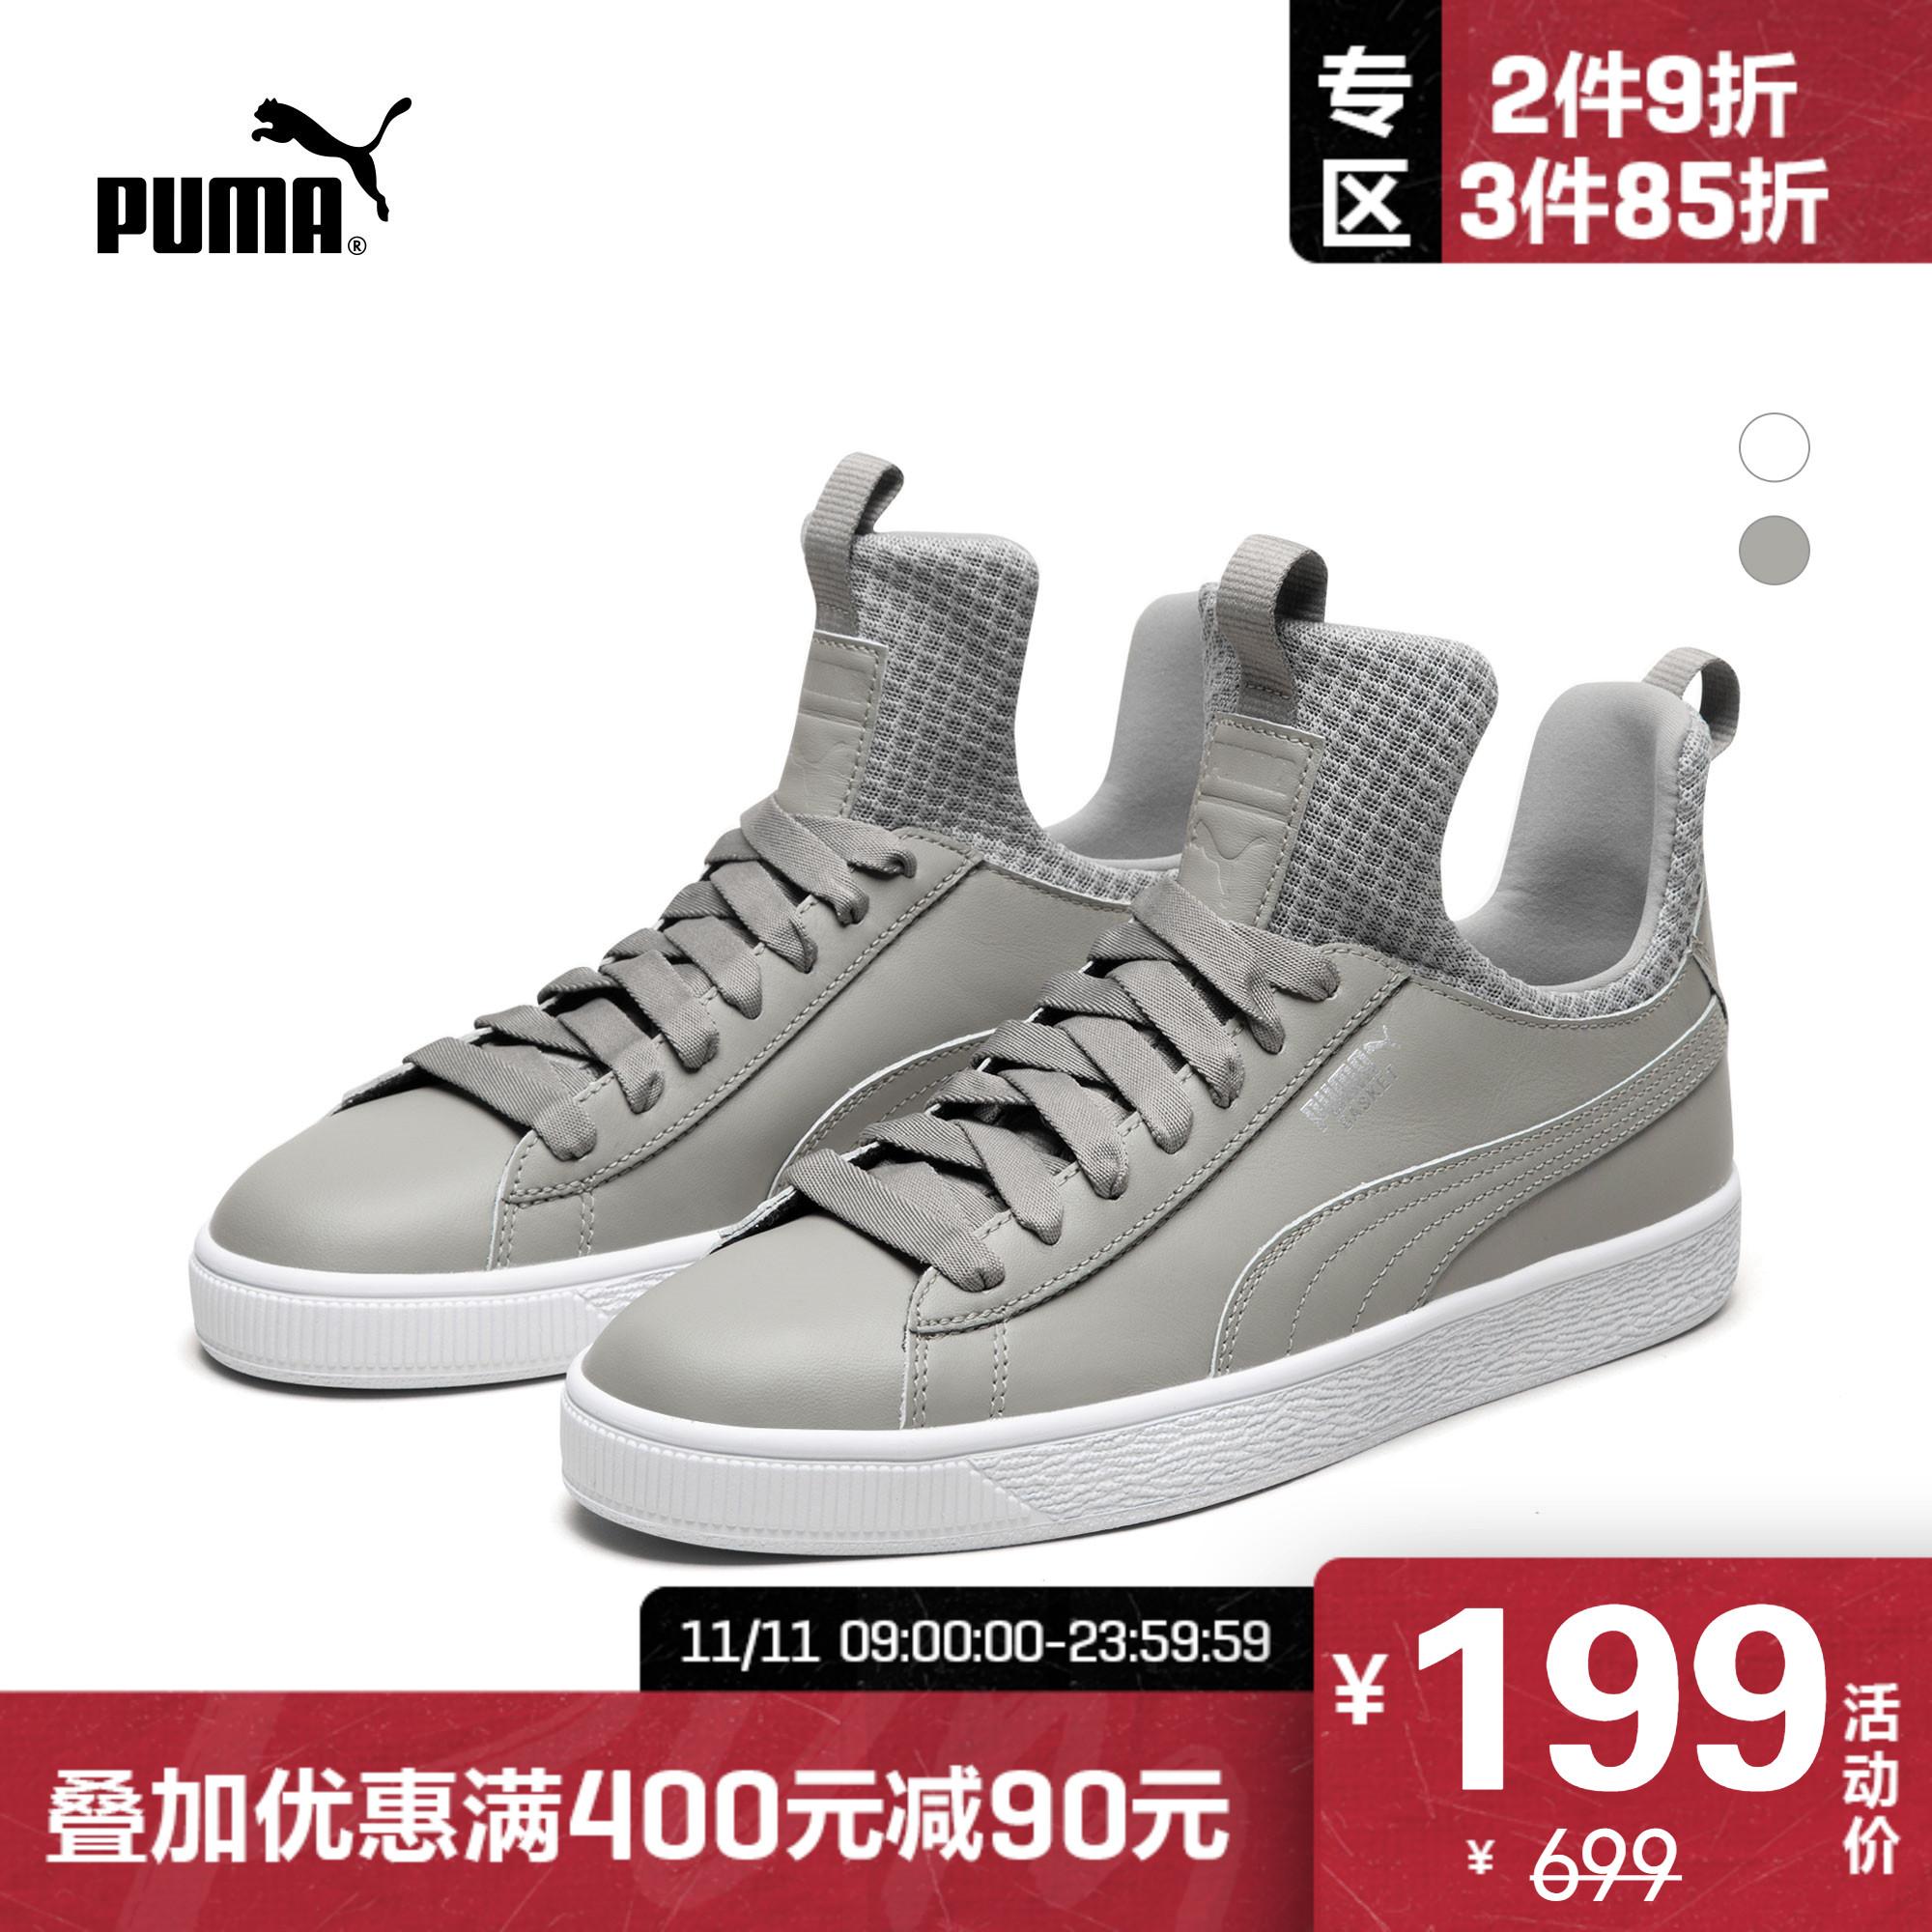 PUMA彪馬官方正品 女子低幫運動休閑鞋板鞋Basket 365663